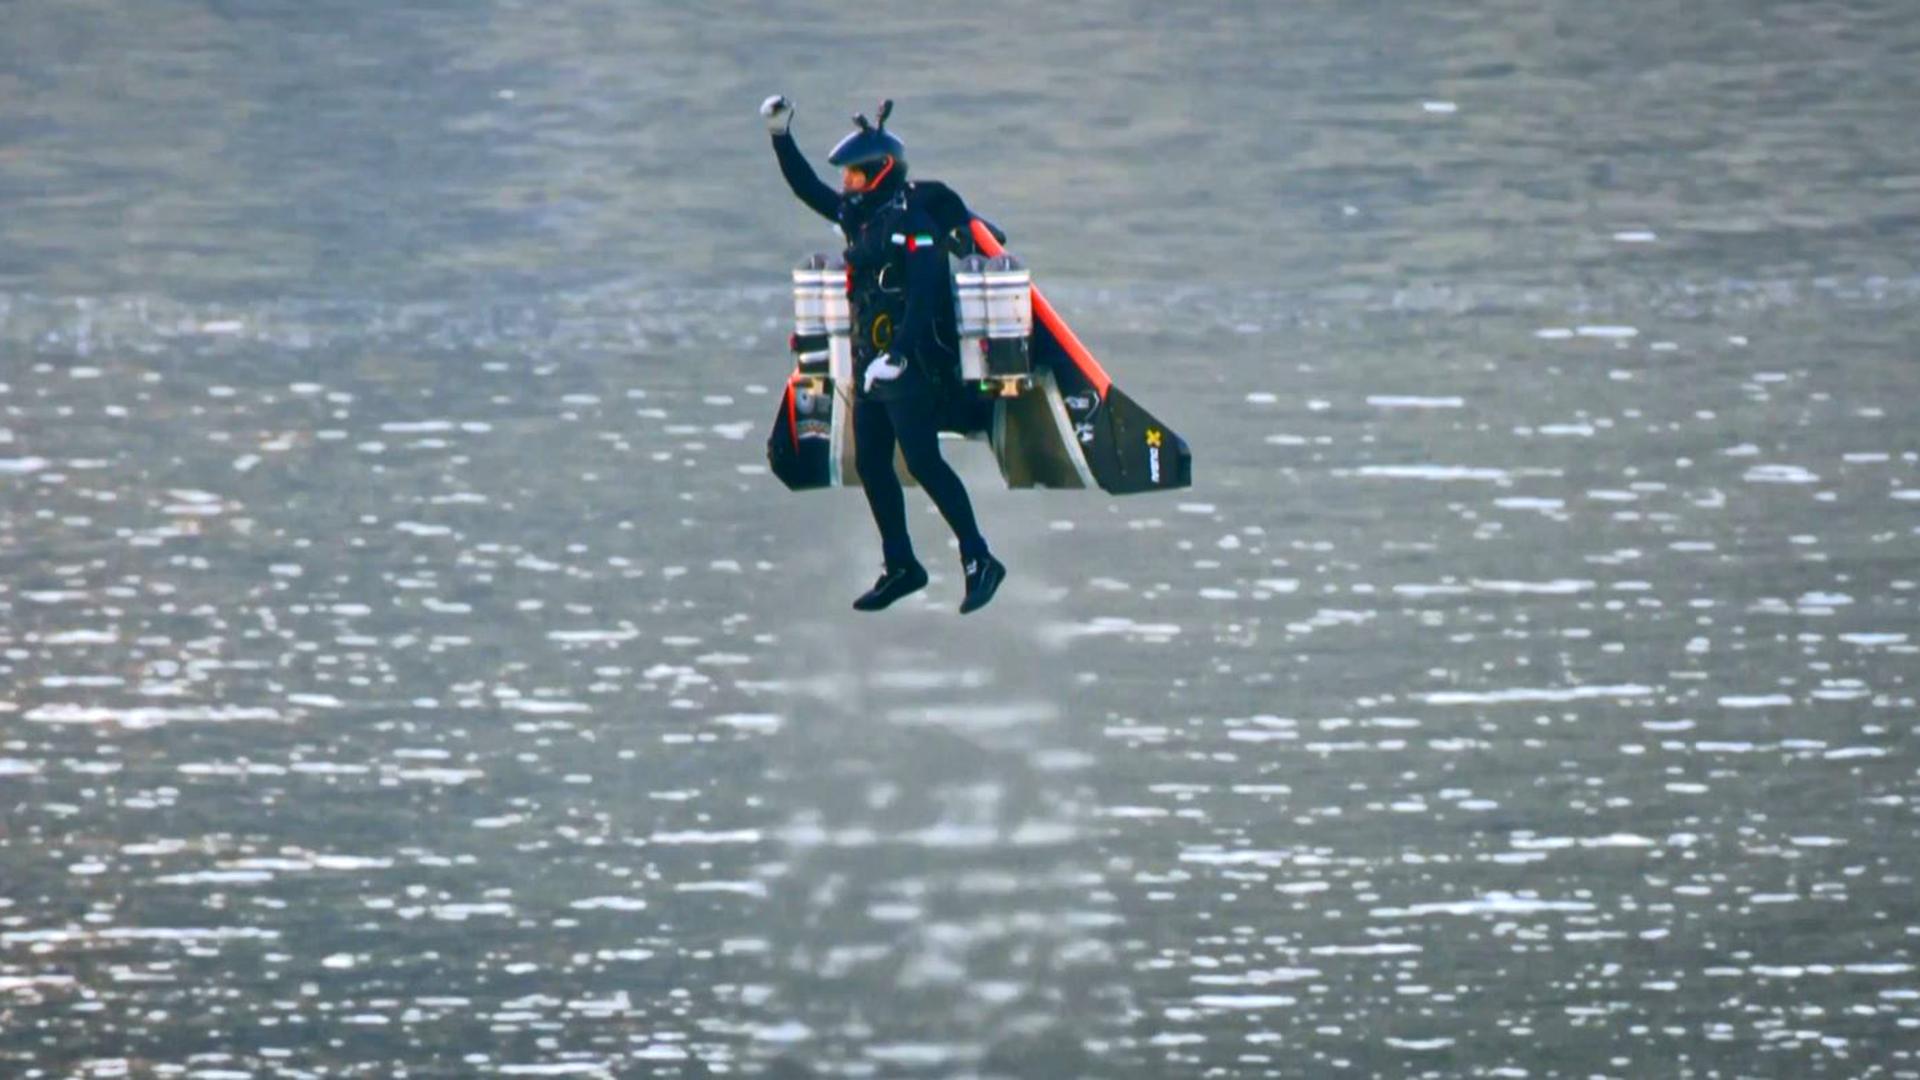 Hombre vuela como Iron Man usando alas tecnológicas